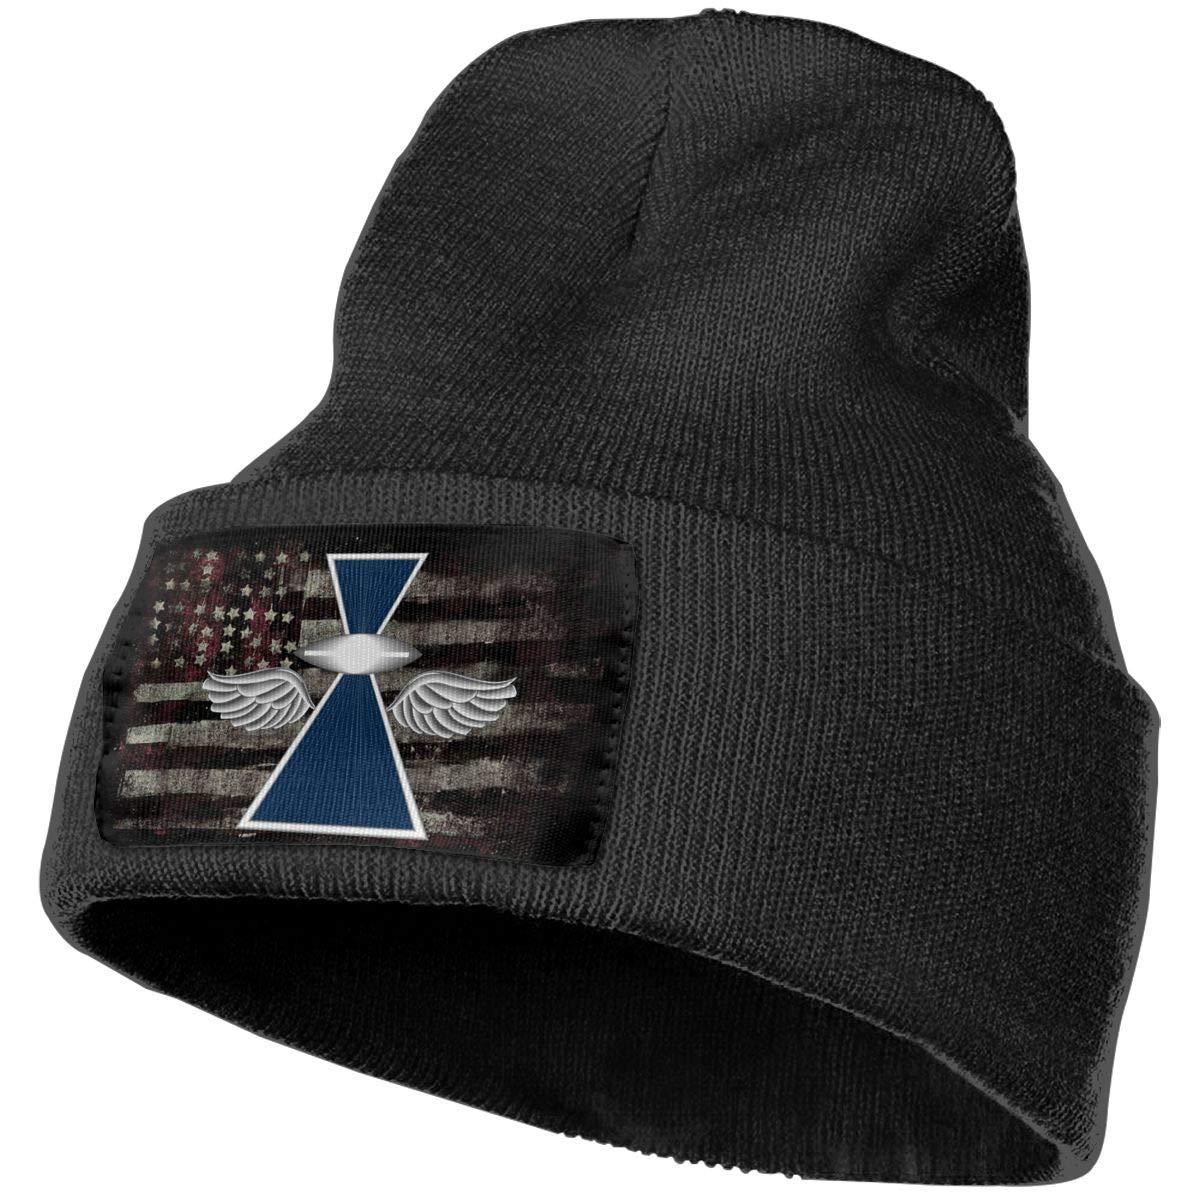 US Navy Photographers Mate Mens Beanie Cap Skull Cap Winter Warm Knitting Hats.